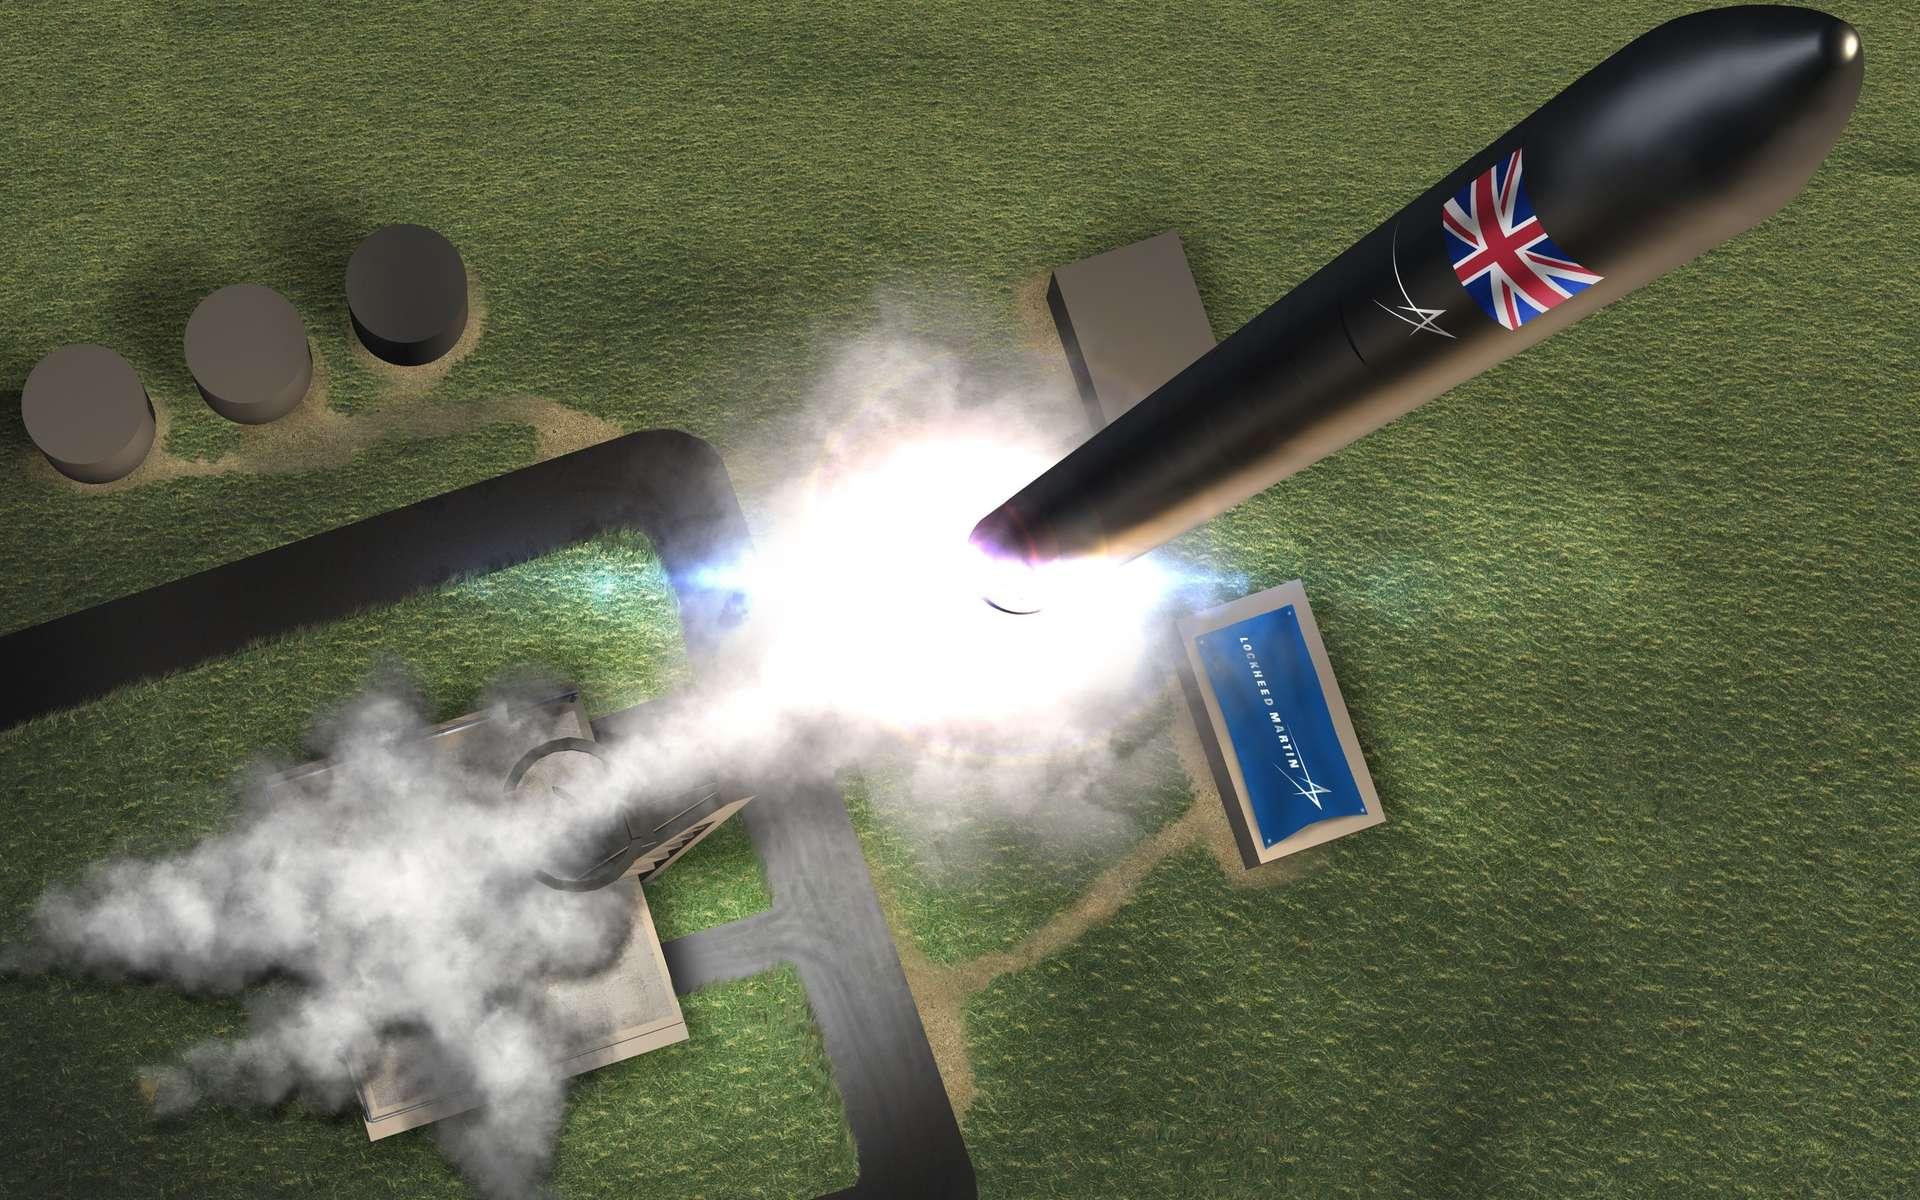 La base de Sutherland servira aux opérations de Lockheed Martin et Orbex. © Lockheed Martin